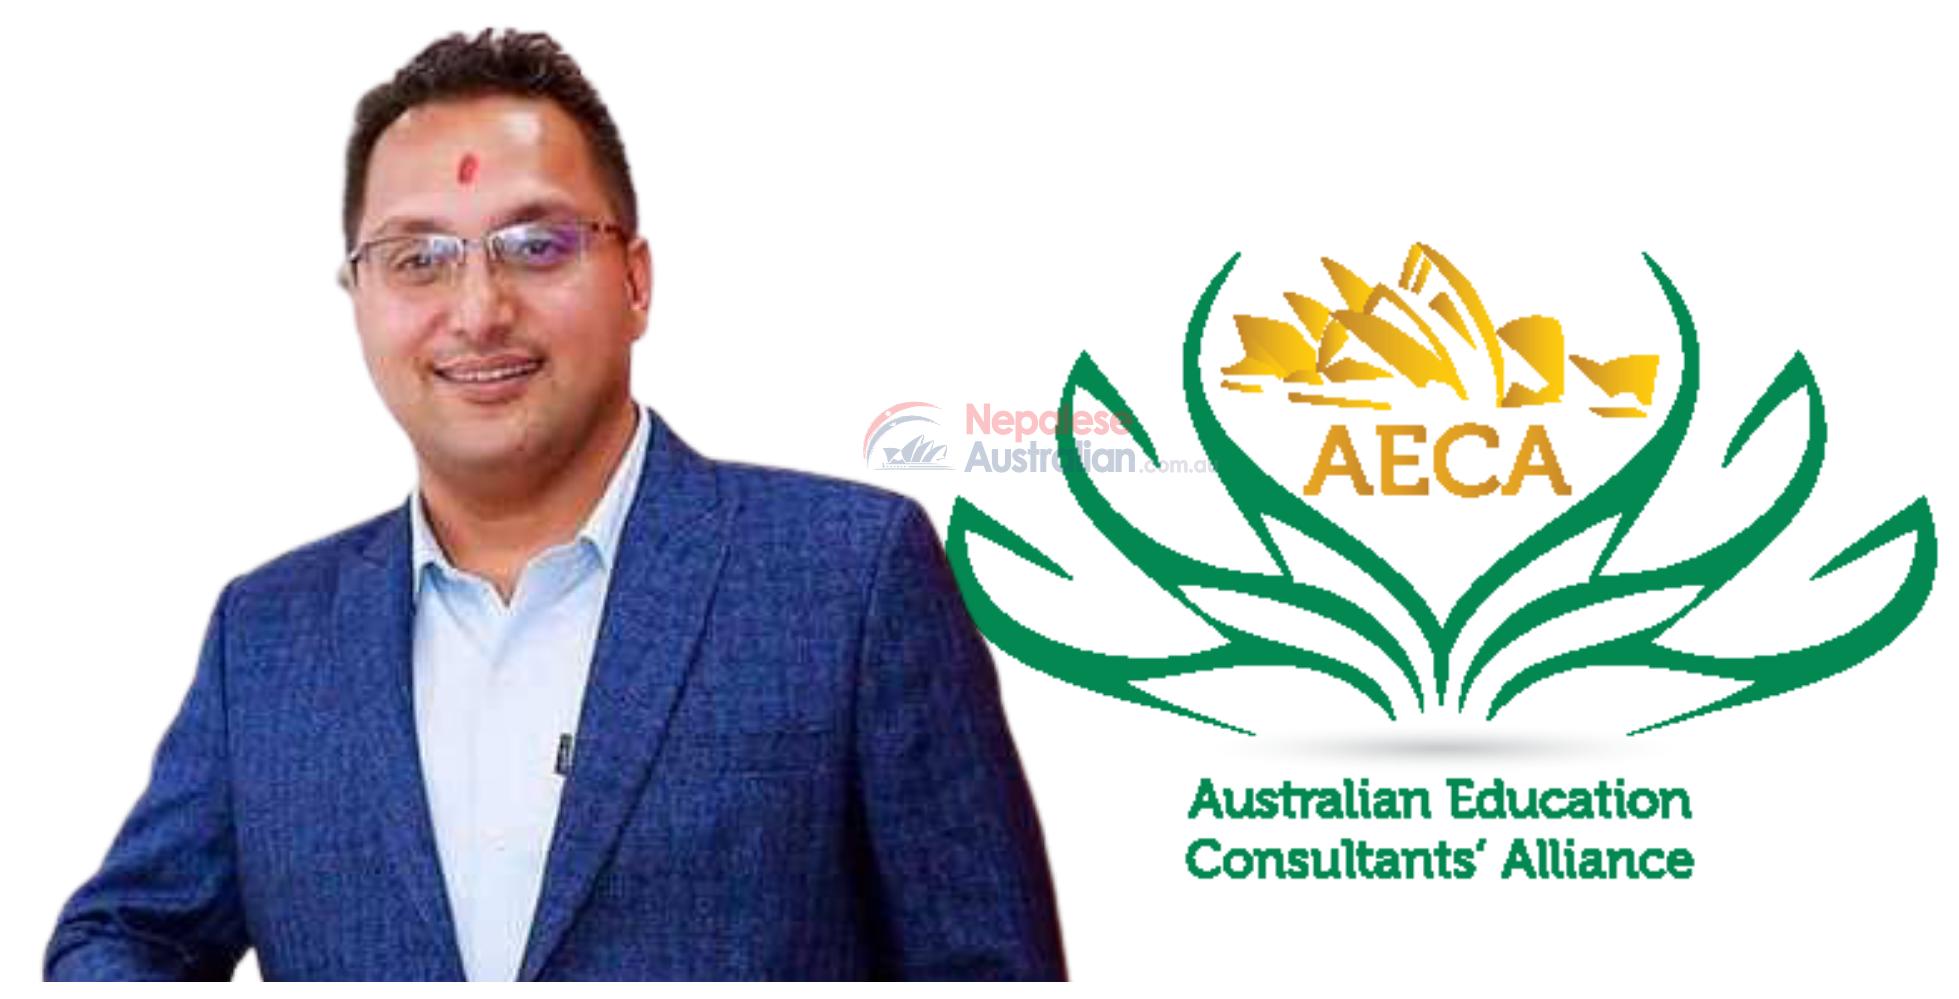 Australian Education Consultants Alliance (AECA) President Bhupal Sitoula